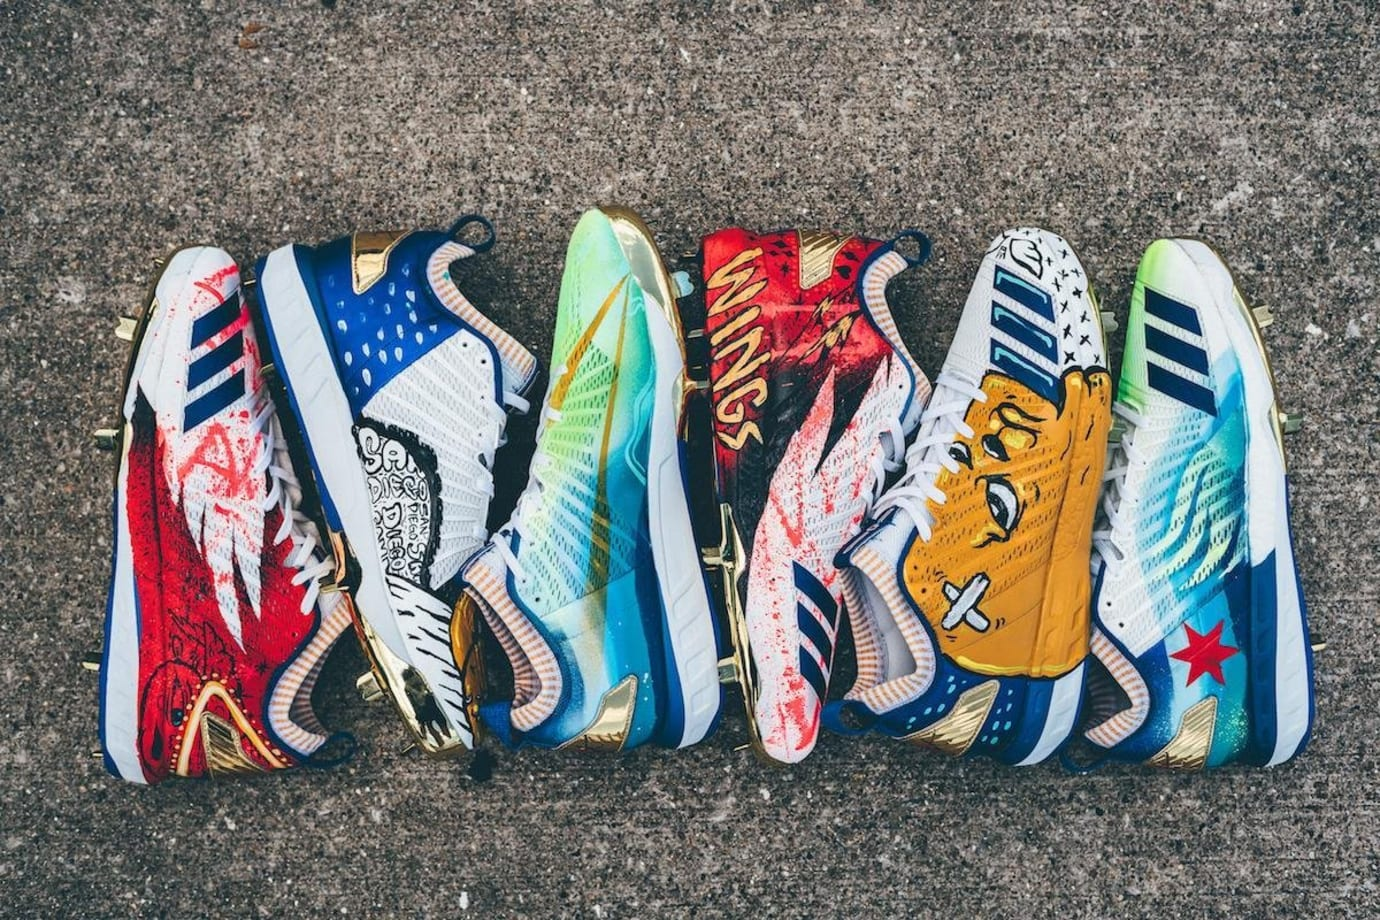 Kris Bryant Adidas Wings for Life Custom Cleats (5)